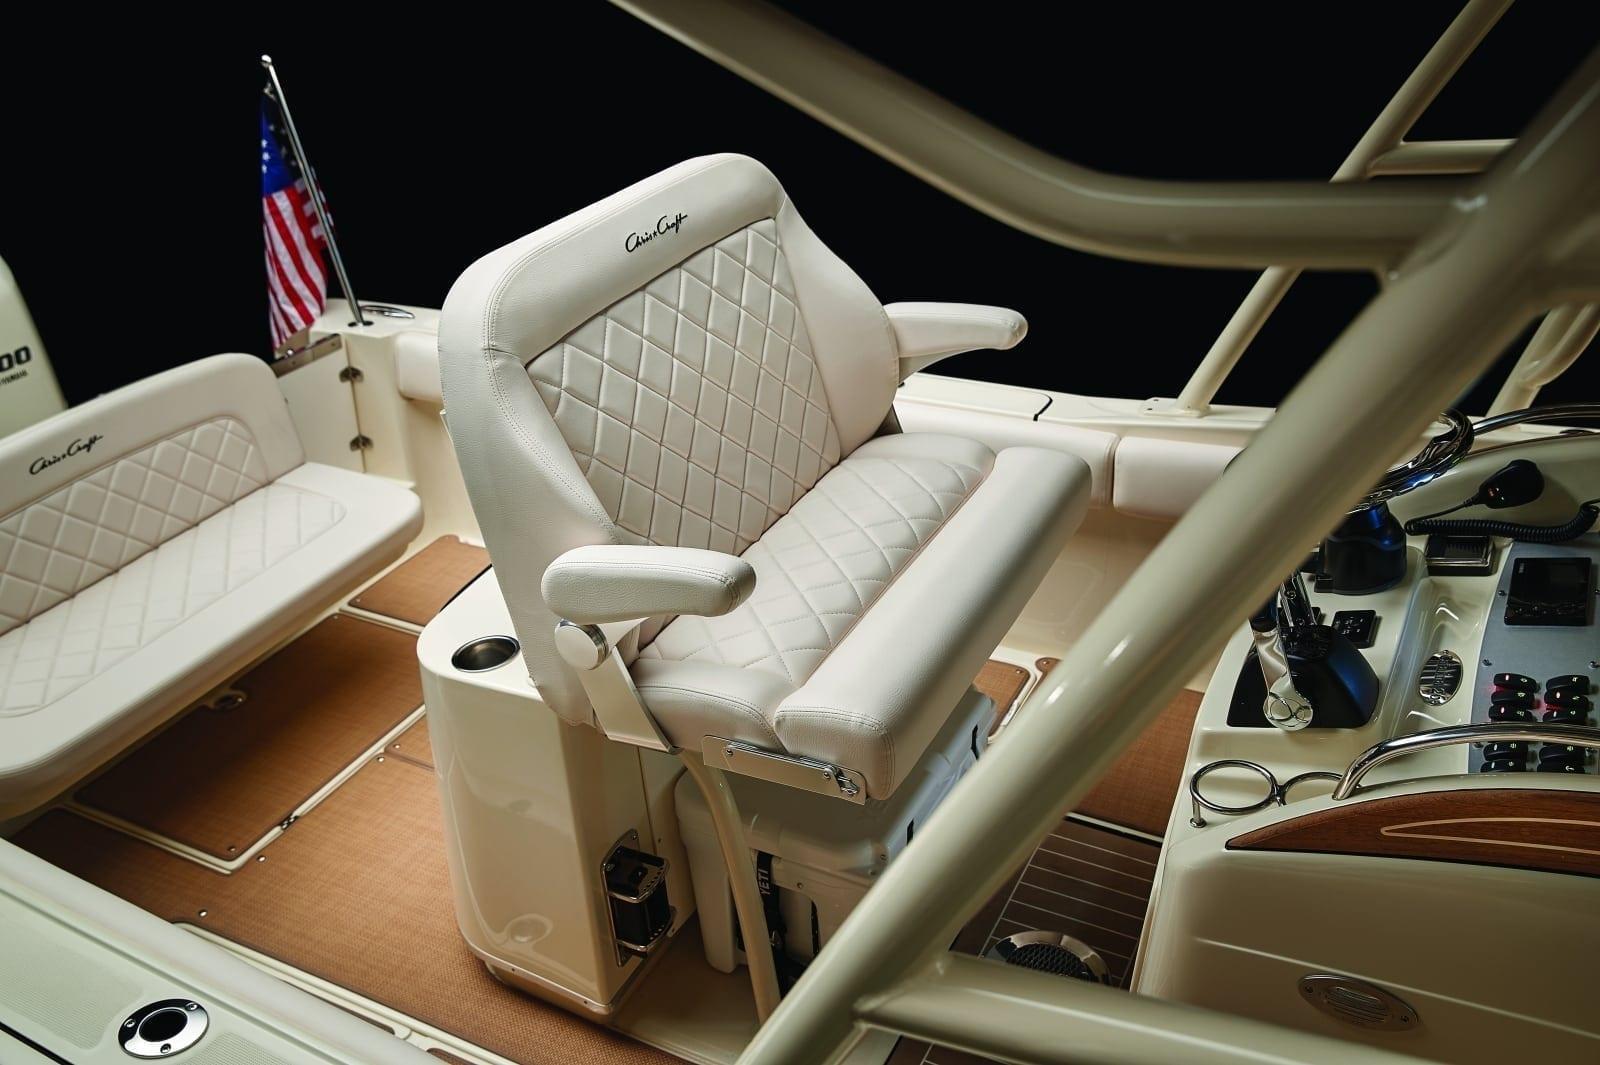 Chris Craft Catalina 26 Captains Chair